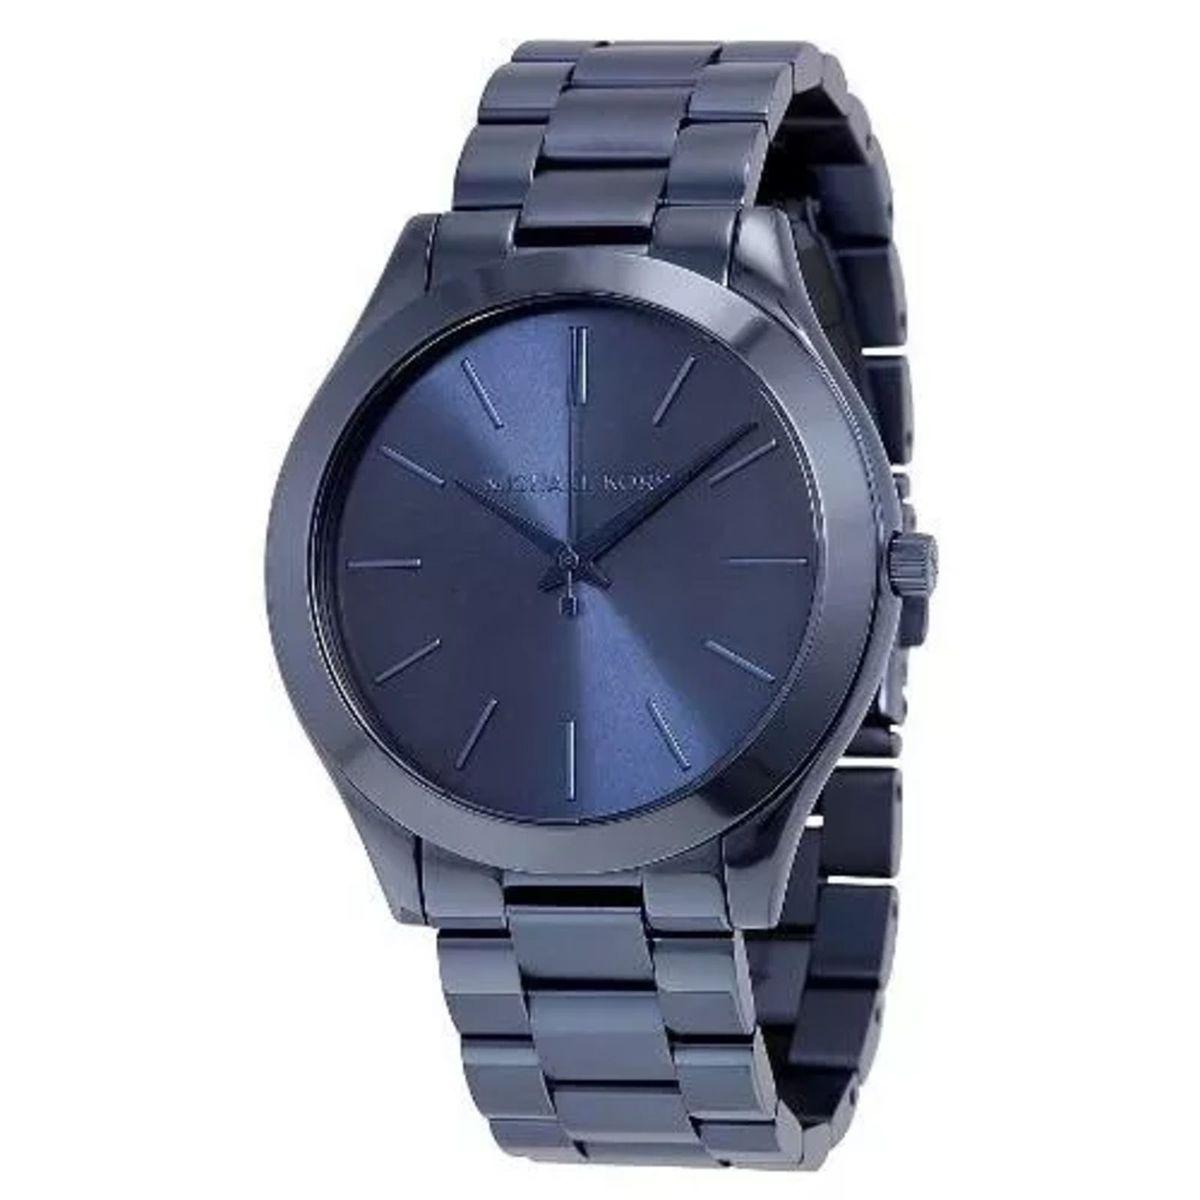 relógio michael kors mk3419 runway azul slim caixa e manual jd1749204 - relógios  michael kors e5b851ef04